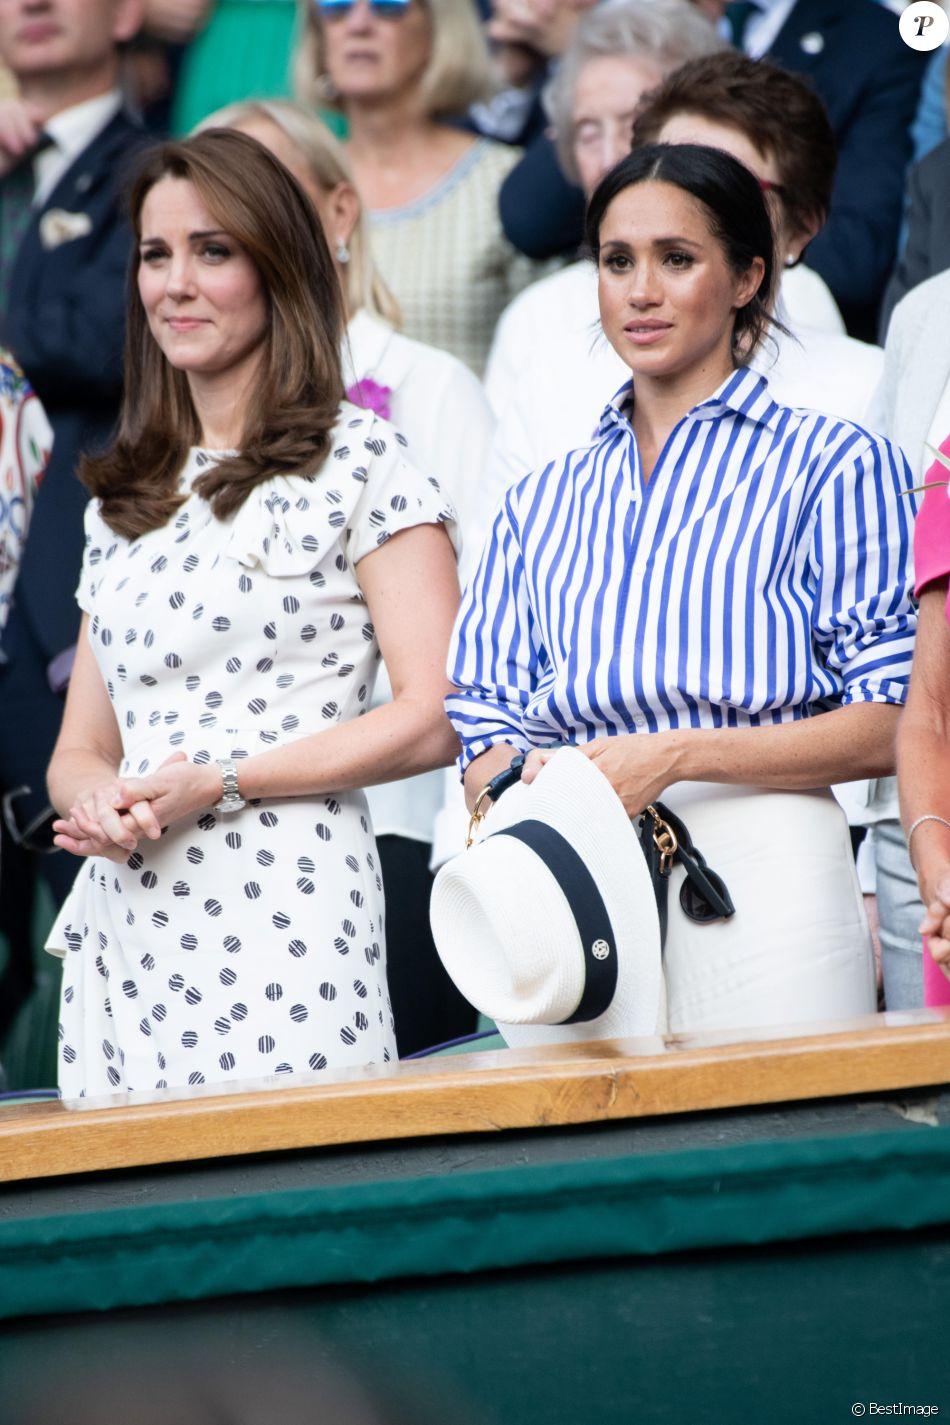 Kate Middleton: Duchess of Cambridge to wear tiara at